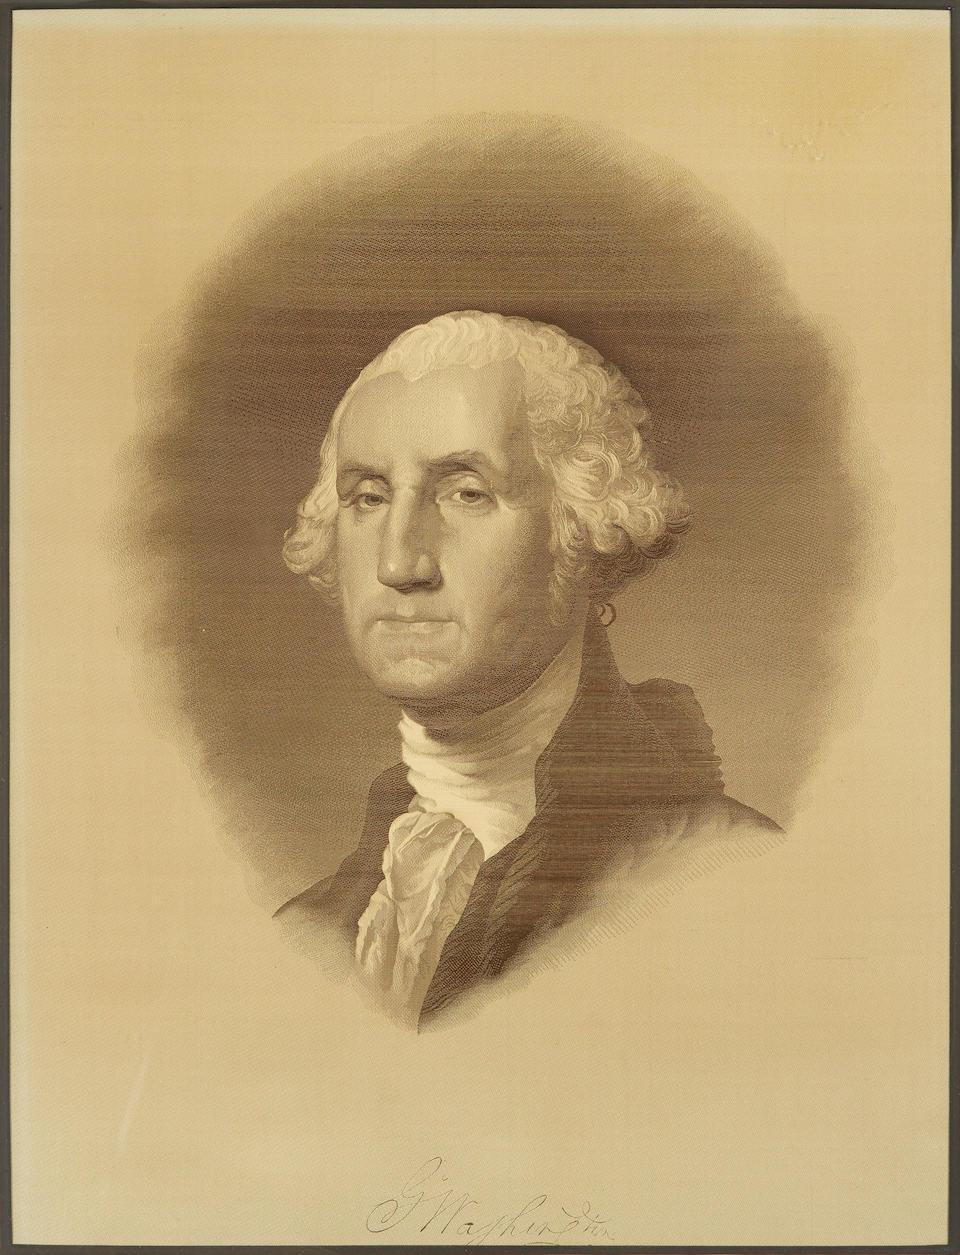 WASHINGTONIANA. [After Gilbert Stuart.] Portrait of George Washington. [n.p: c.1855.]